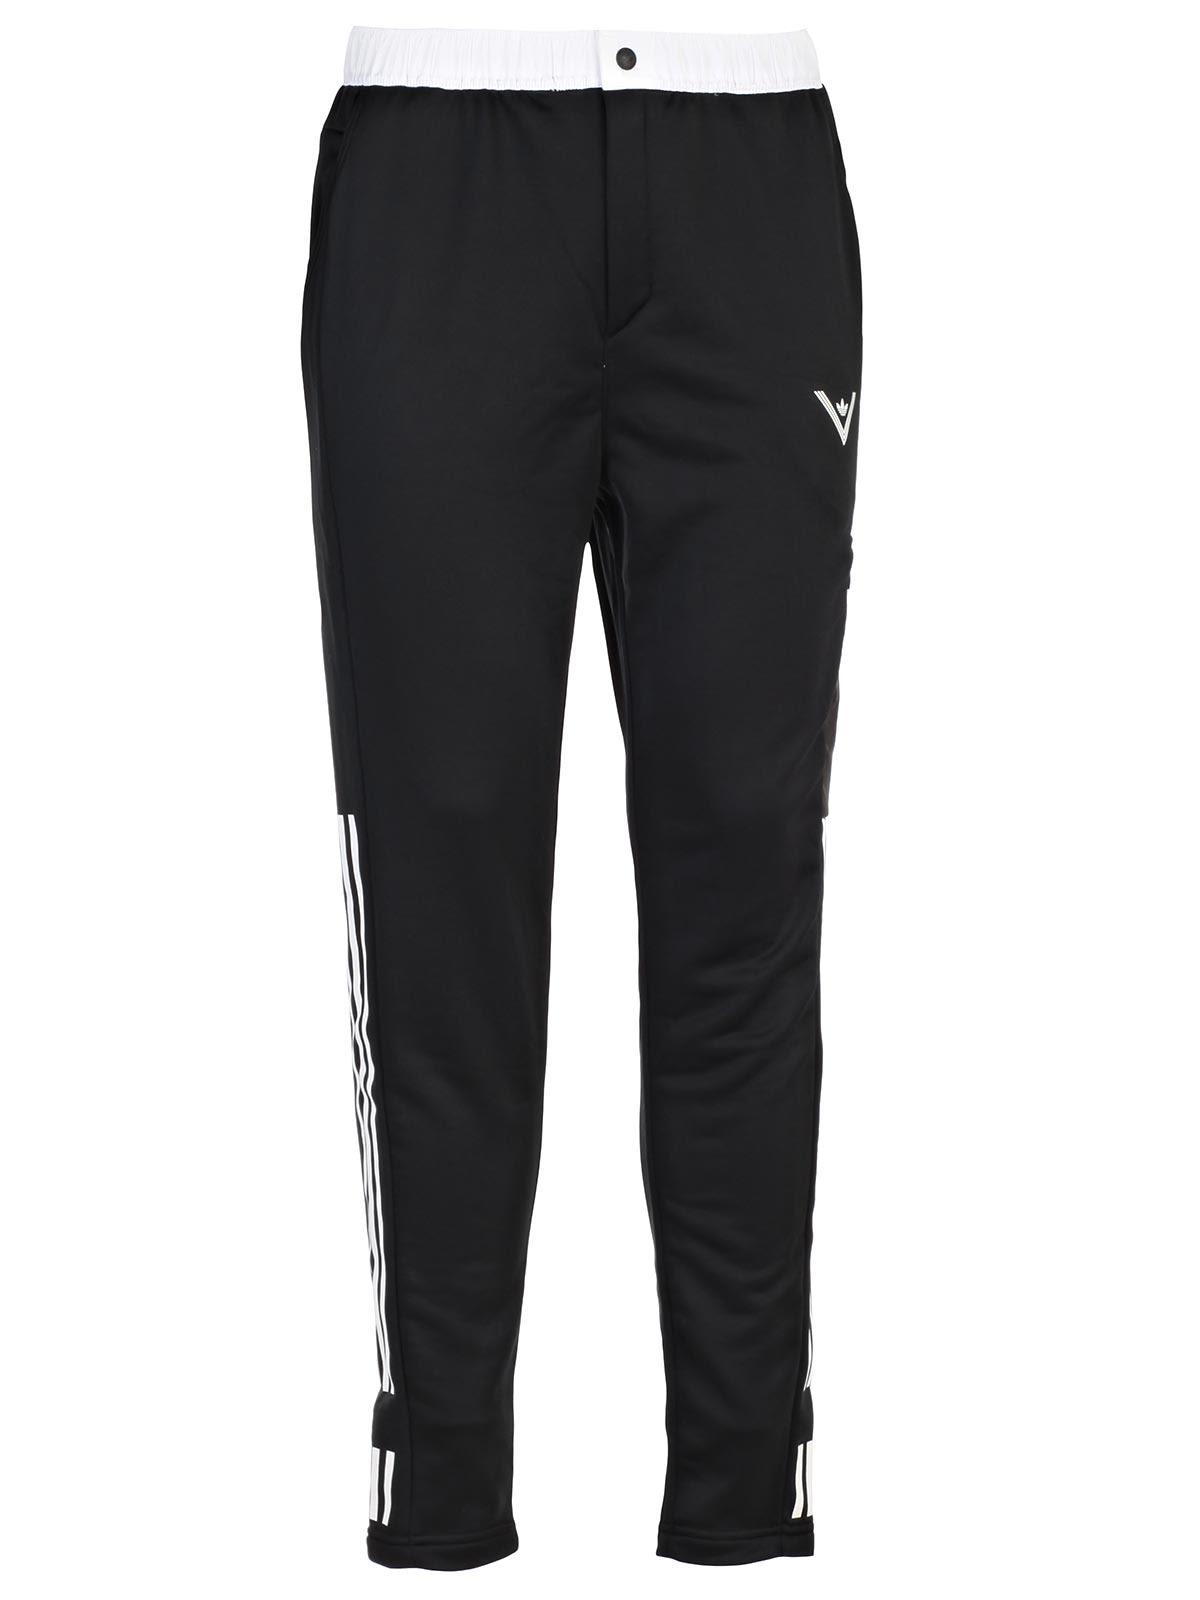 Adidas Originals x White Mountaineering Trousers